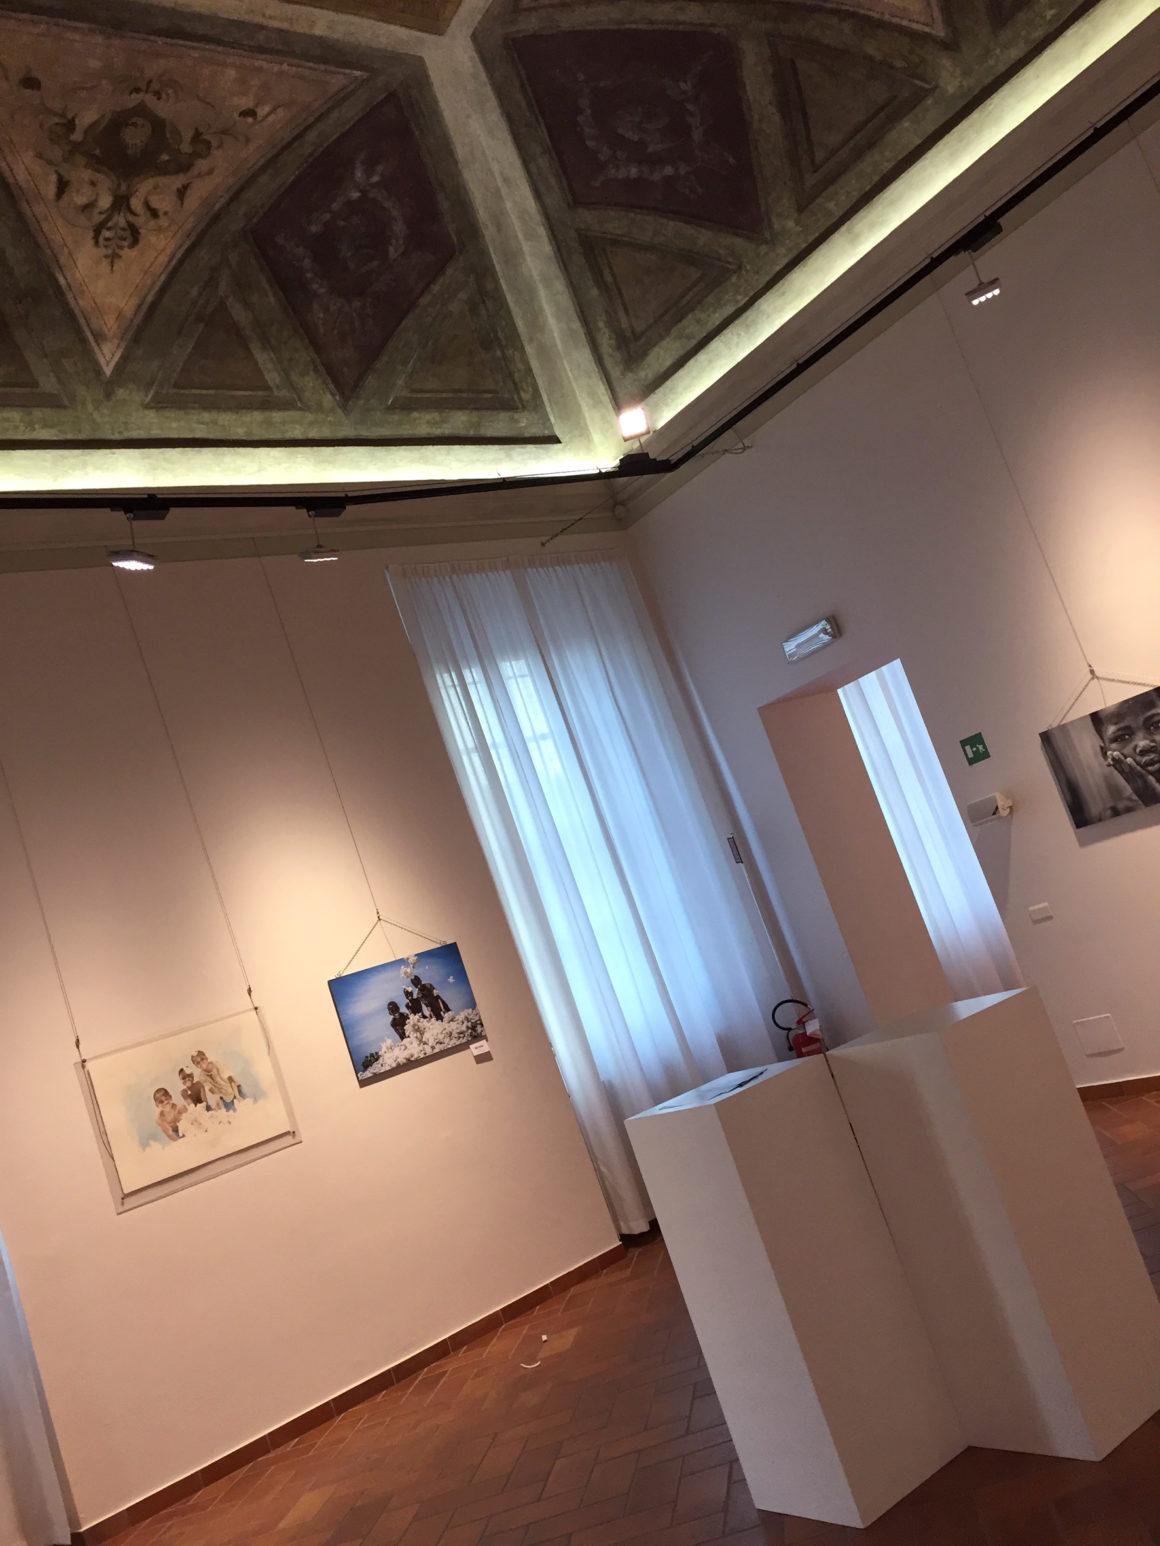 Lentini Designer Palazzo Pirola Gorgonzola